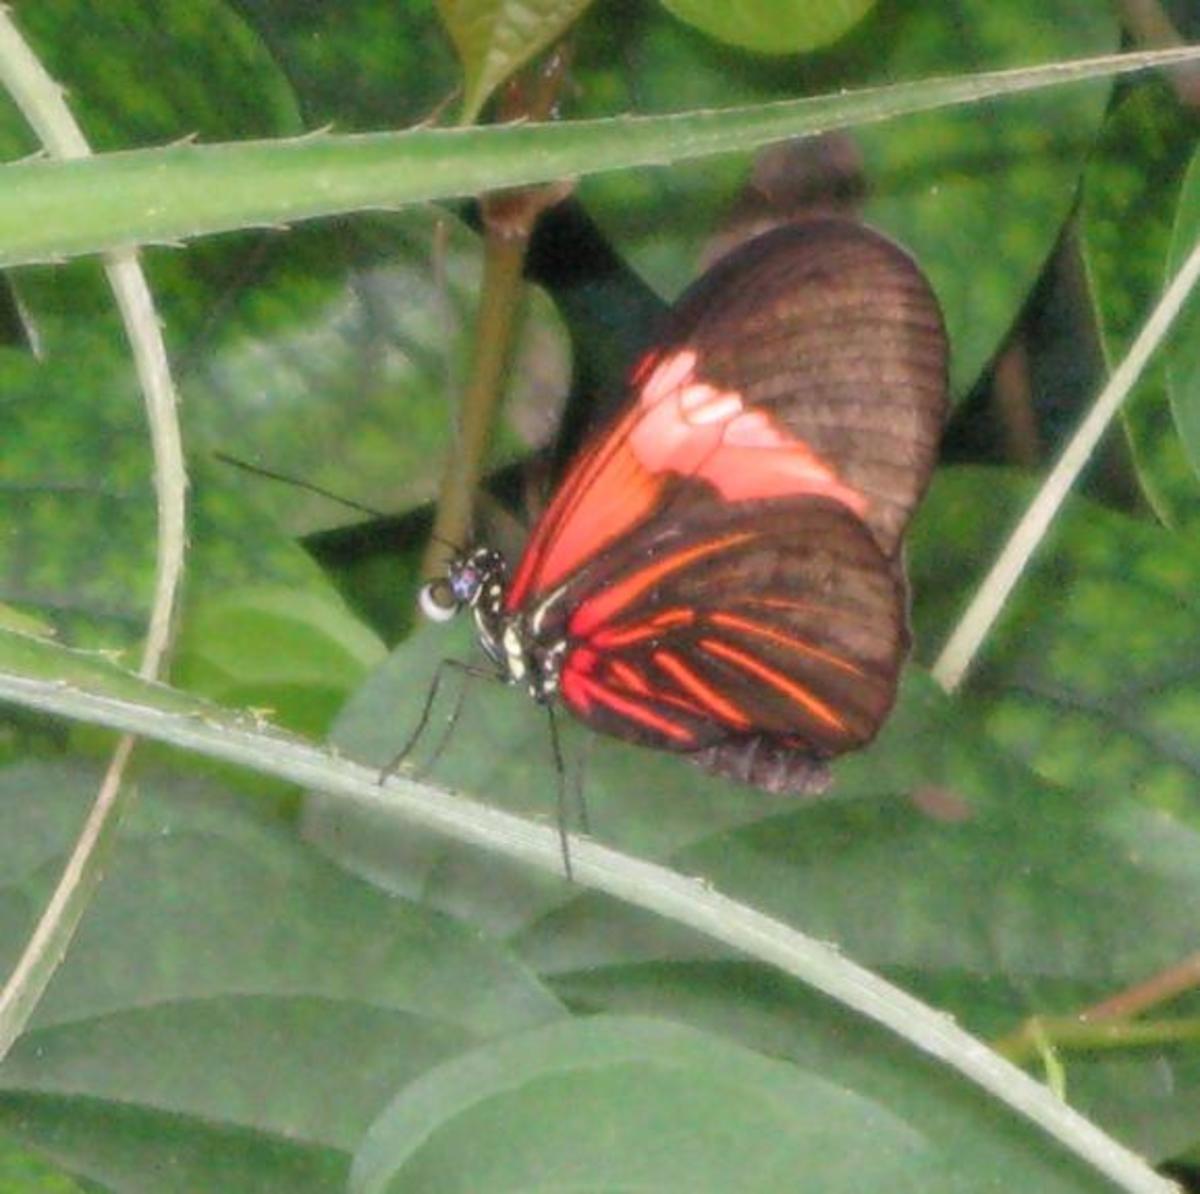 Butterfly resting on a plant stem